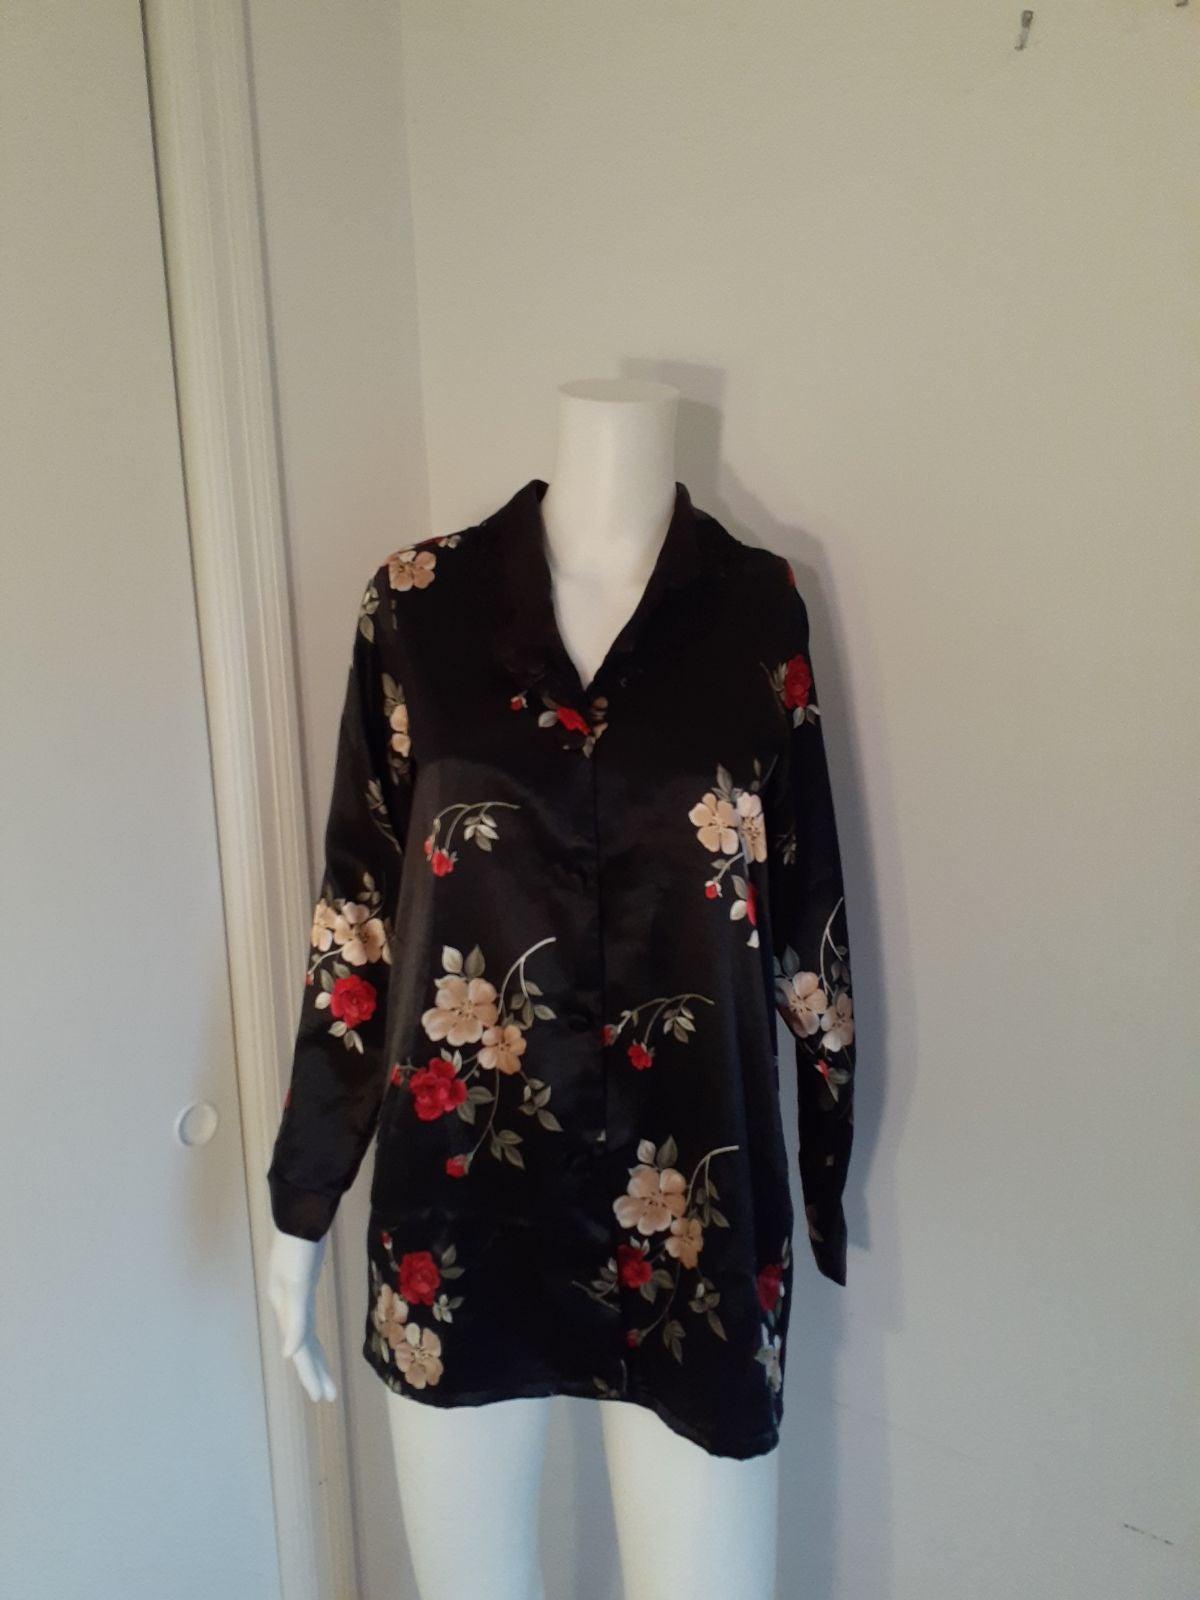 4/6 Adonna black floral satin pajama top